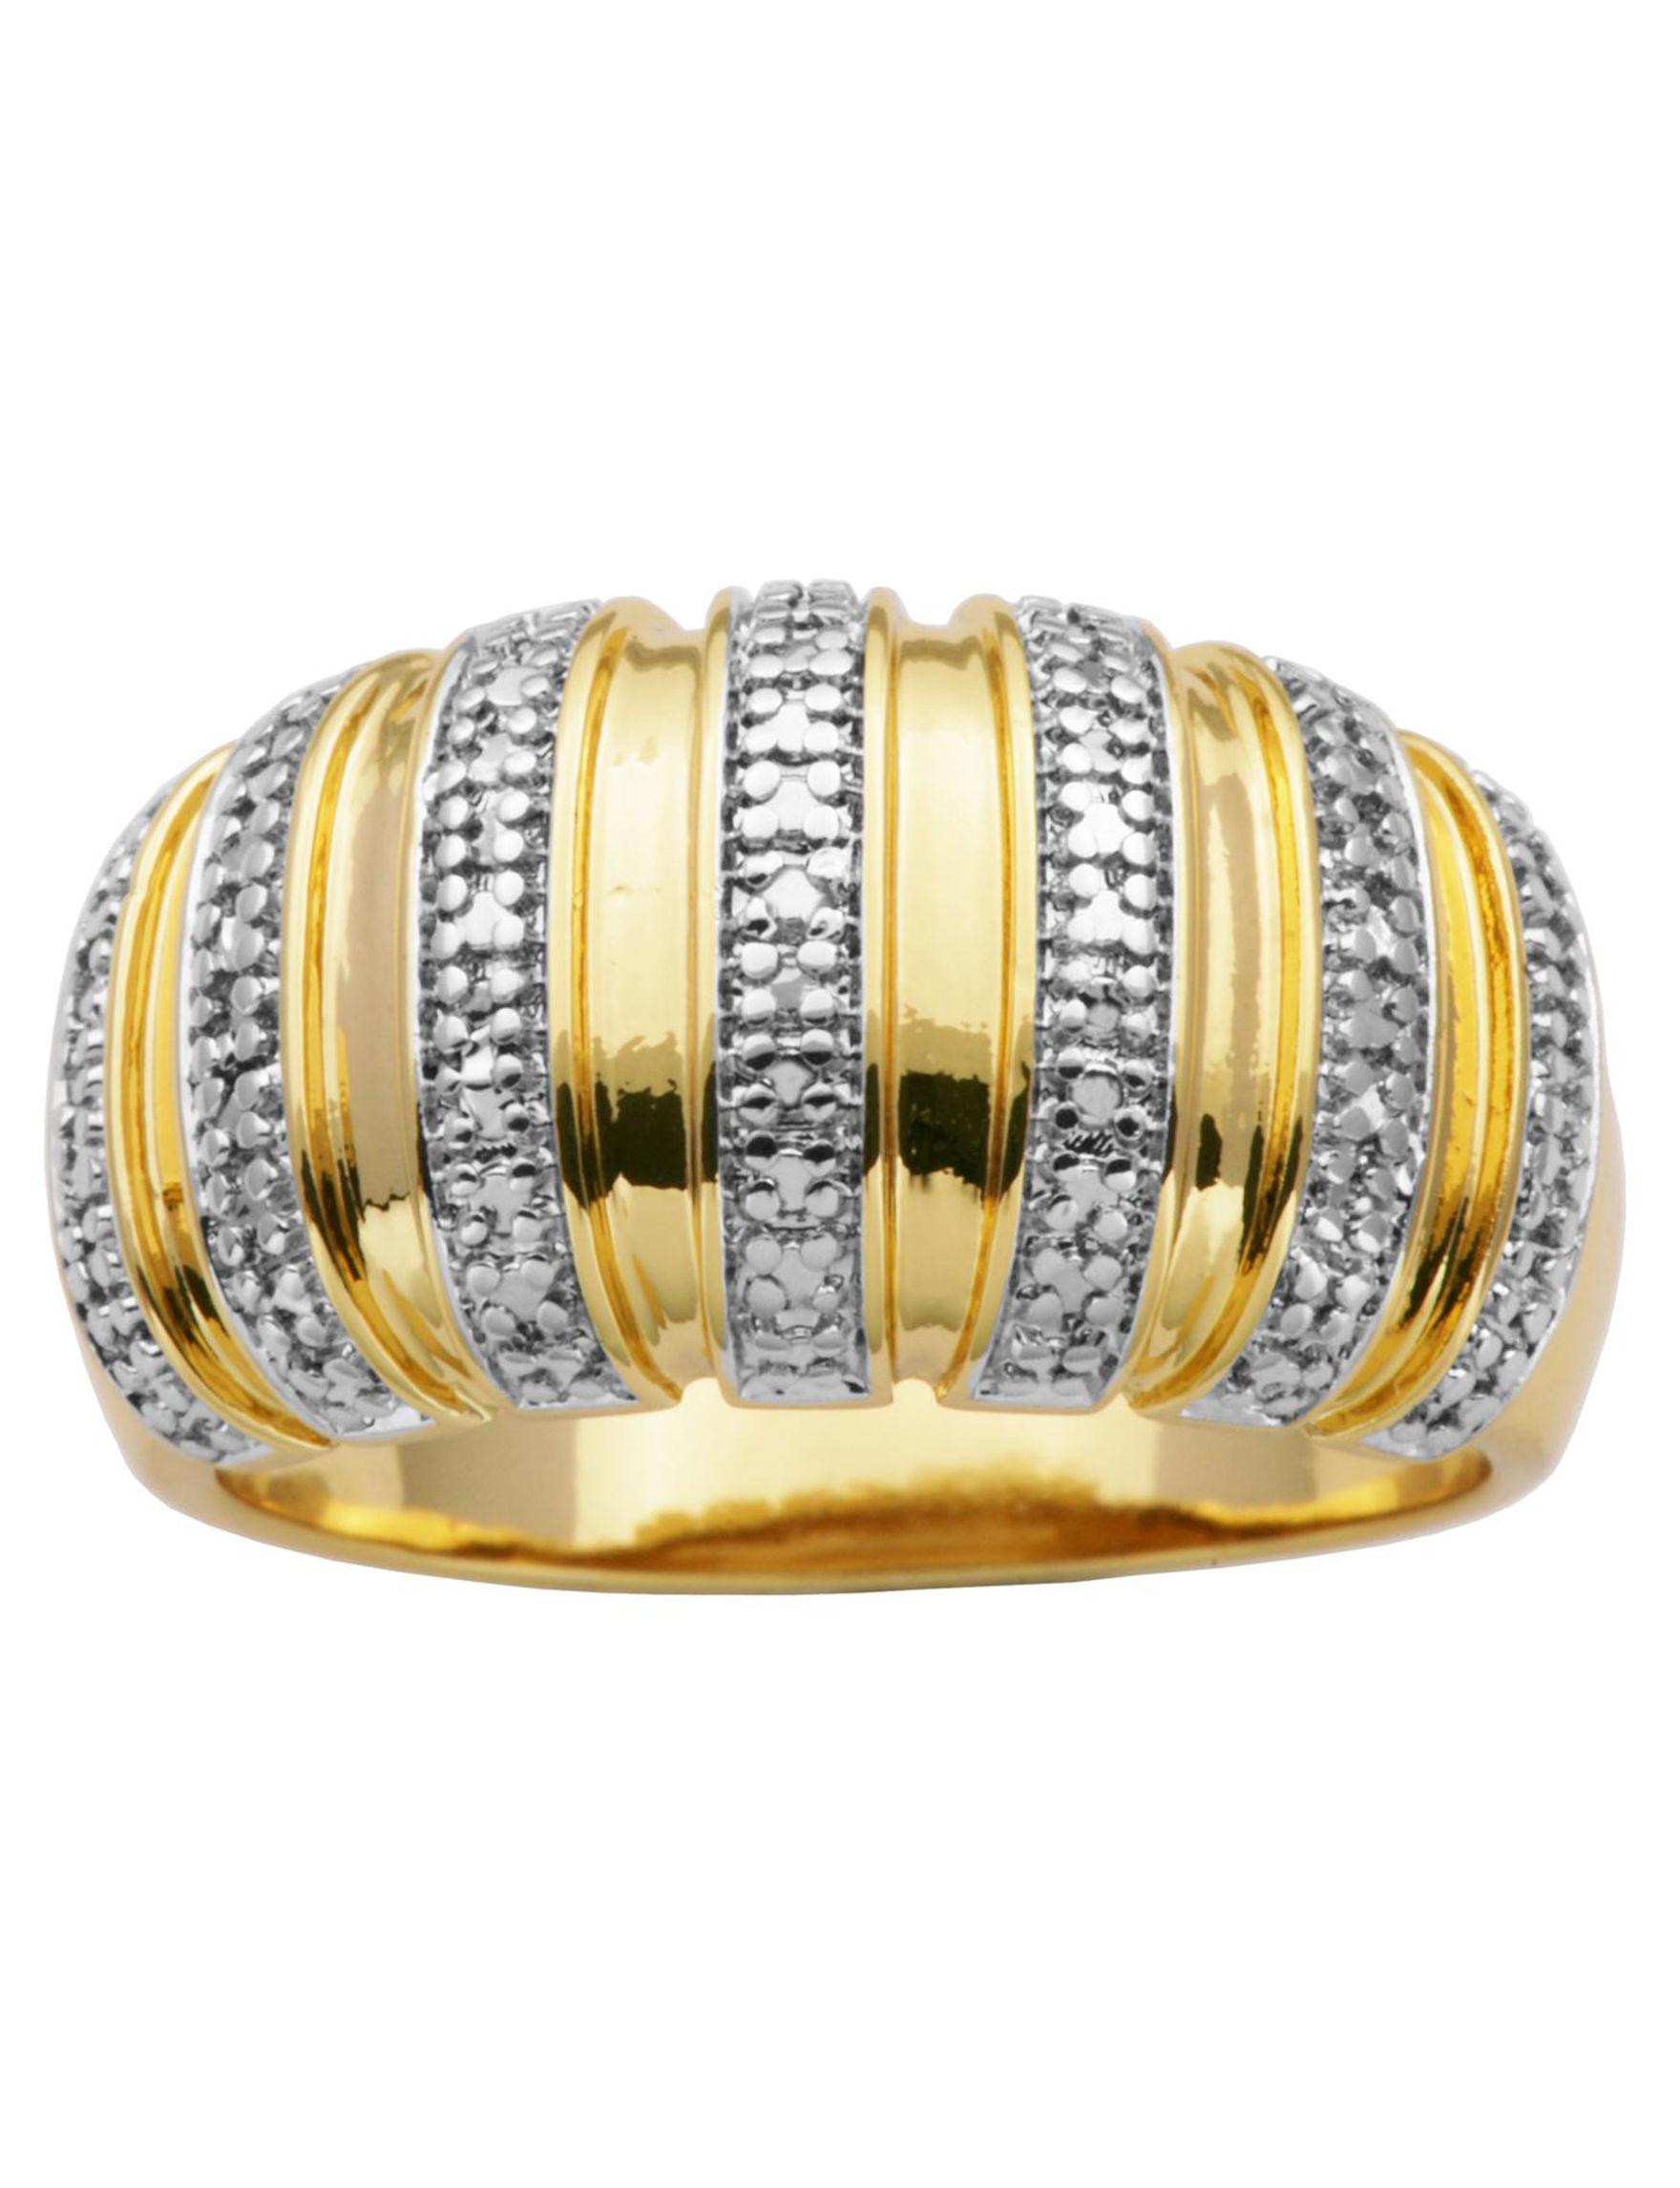 PAJ INC. Assorted Rings Fine Jewelry